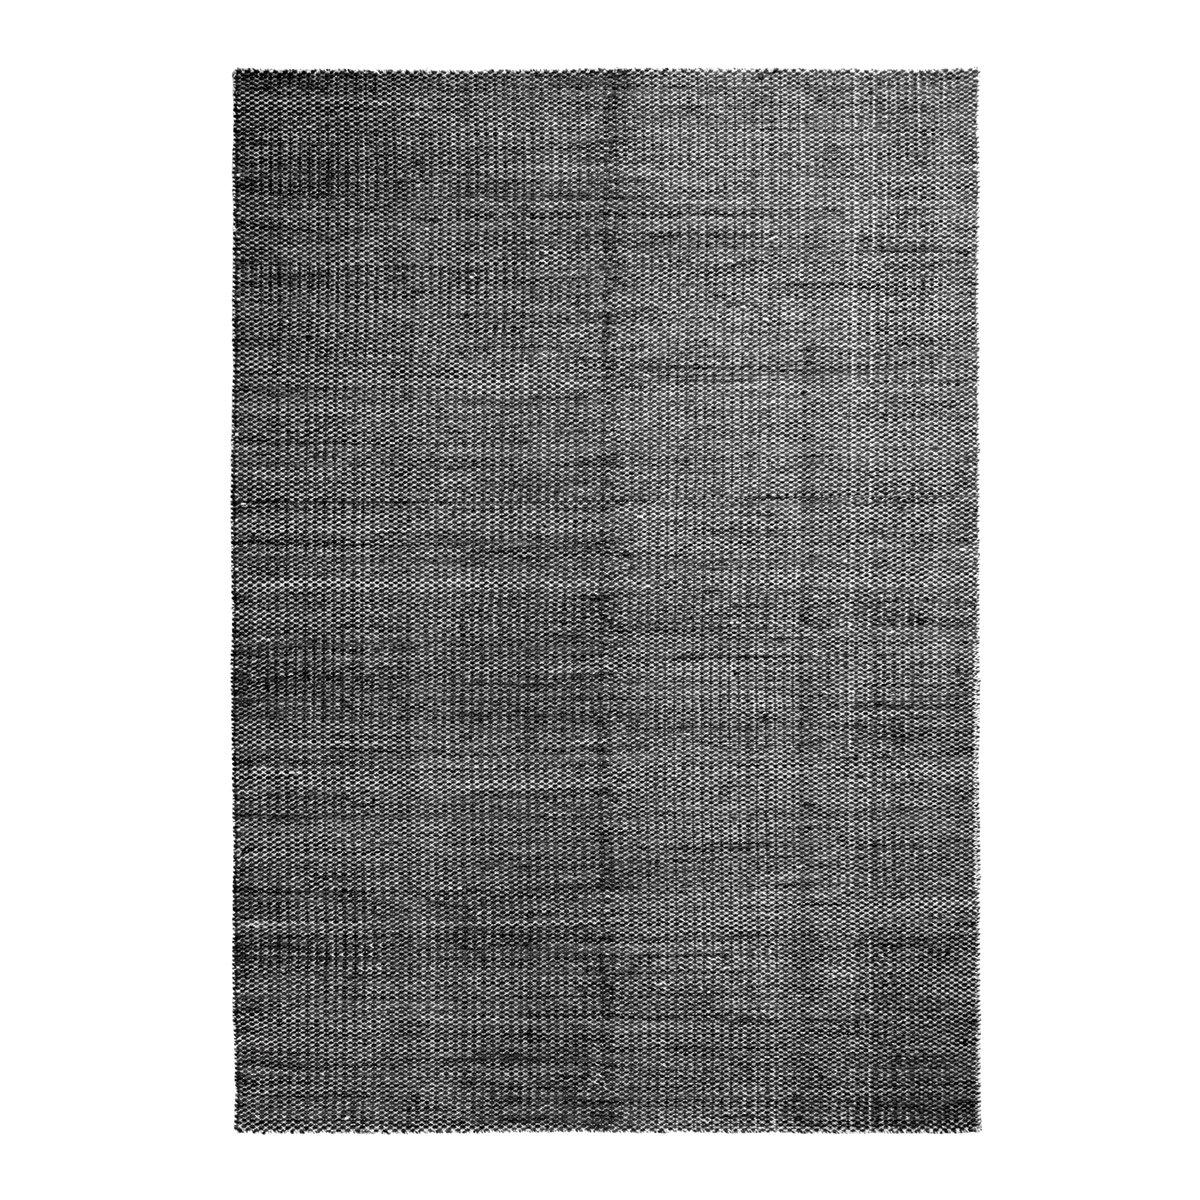 HAY Moir� Vloerkleed Zwart - l. 300 x b. 200 cm.